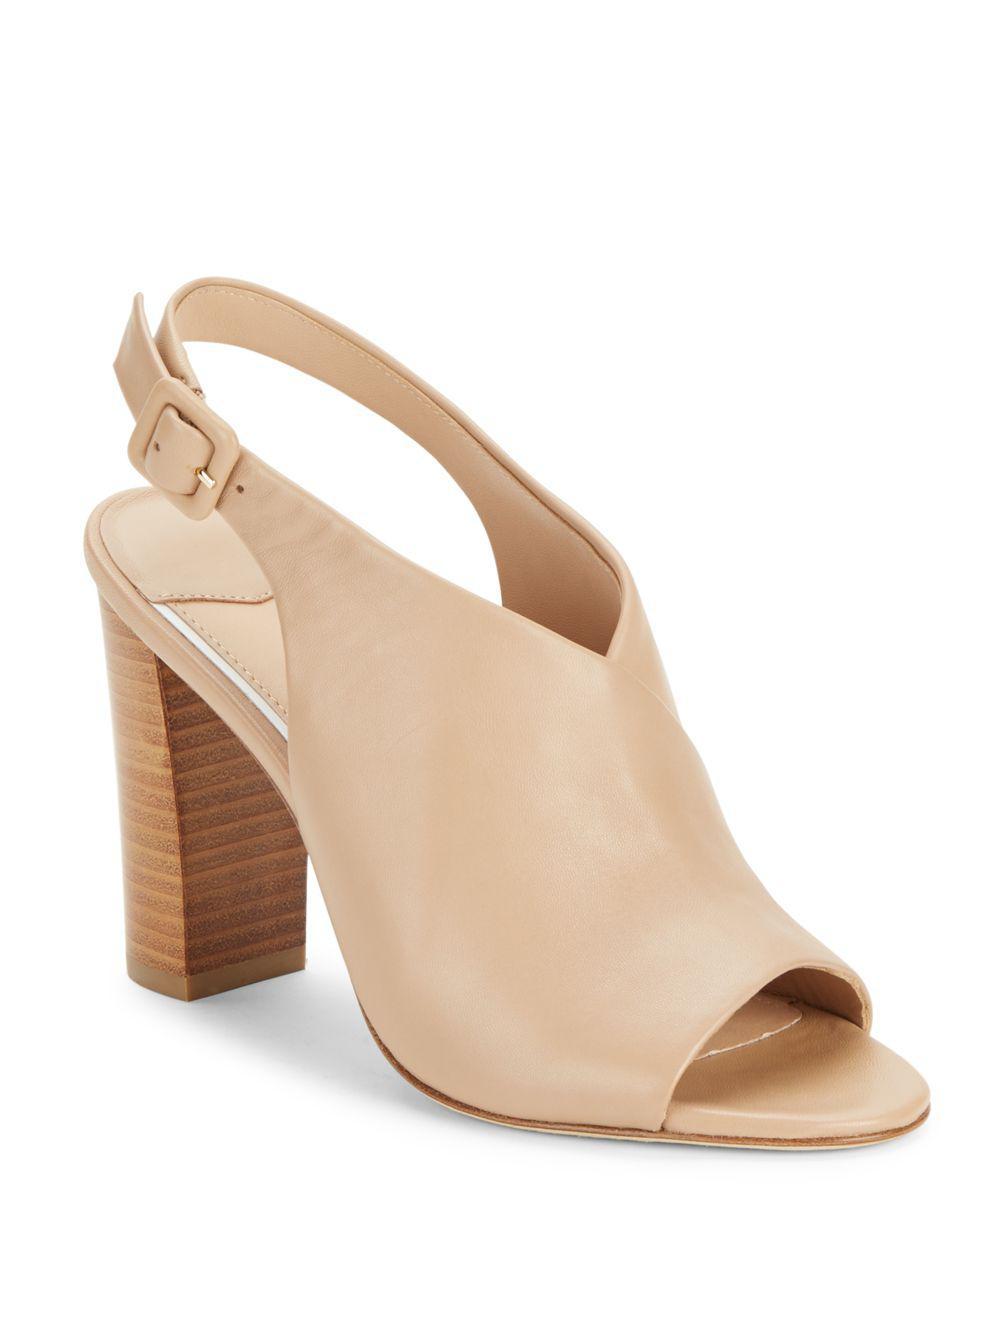 Diane von Furstenberg Leather Slingback Sandals brand new unisex cheap online ZEJBIt5ngW